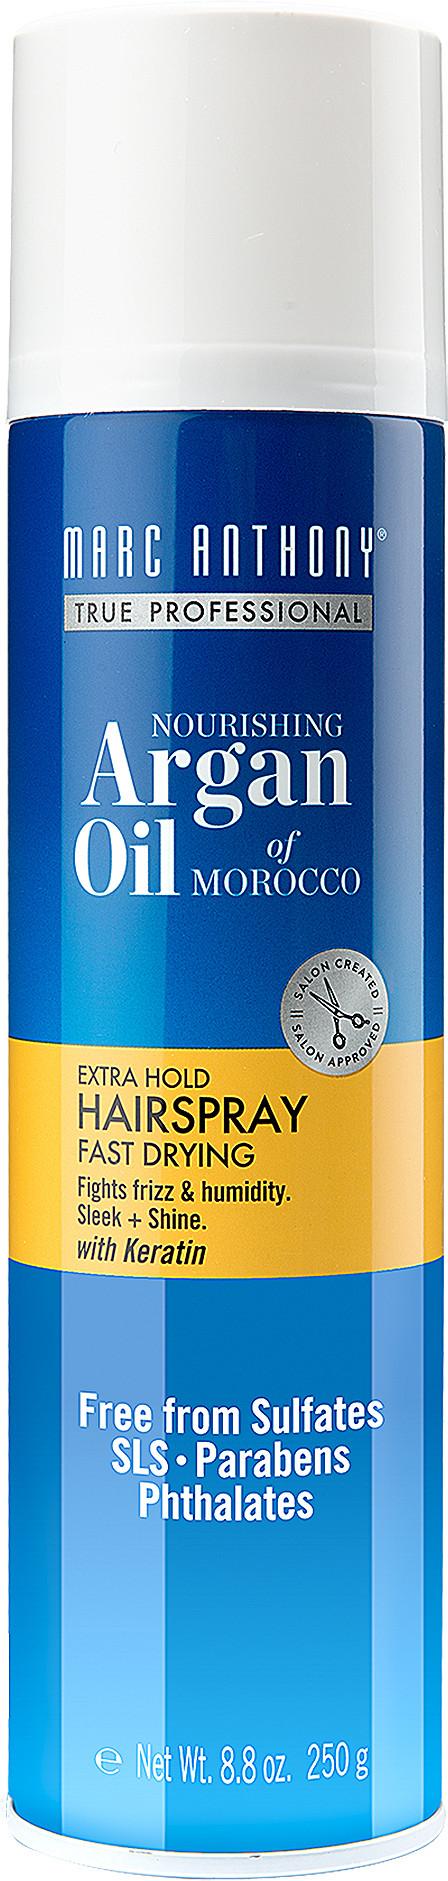 Marc Anthony Oil Of Morocco Argan Volume Shine Hairspray Ulta Beauty